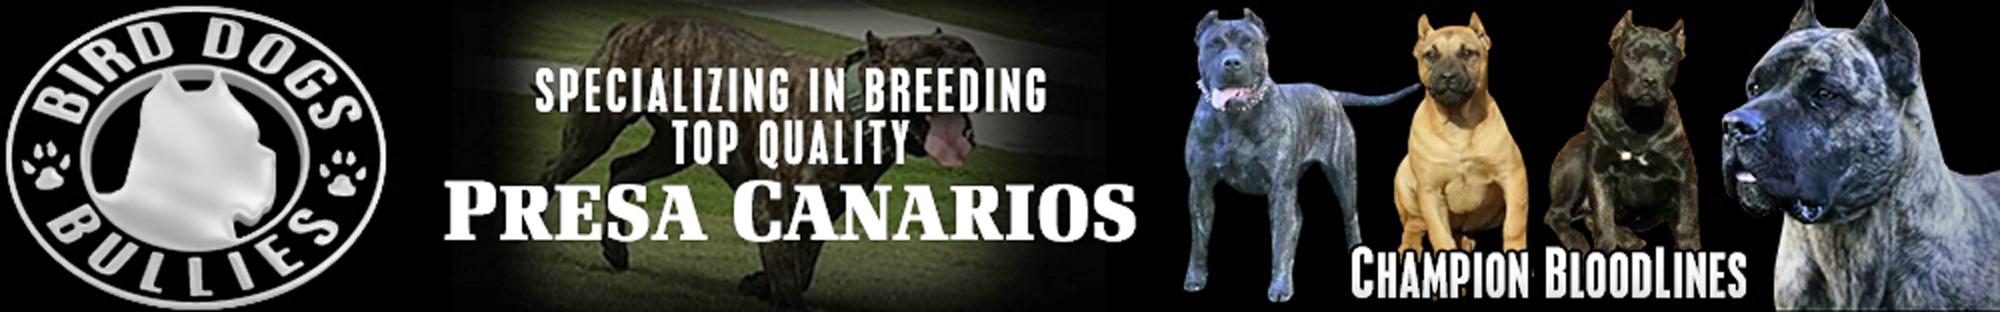 BirdDogsBullies Banner